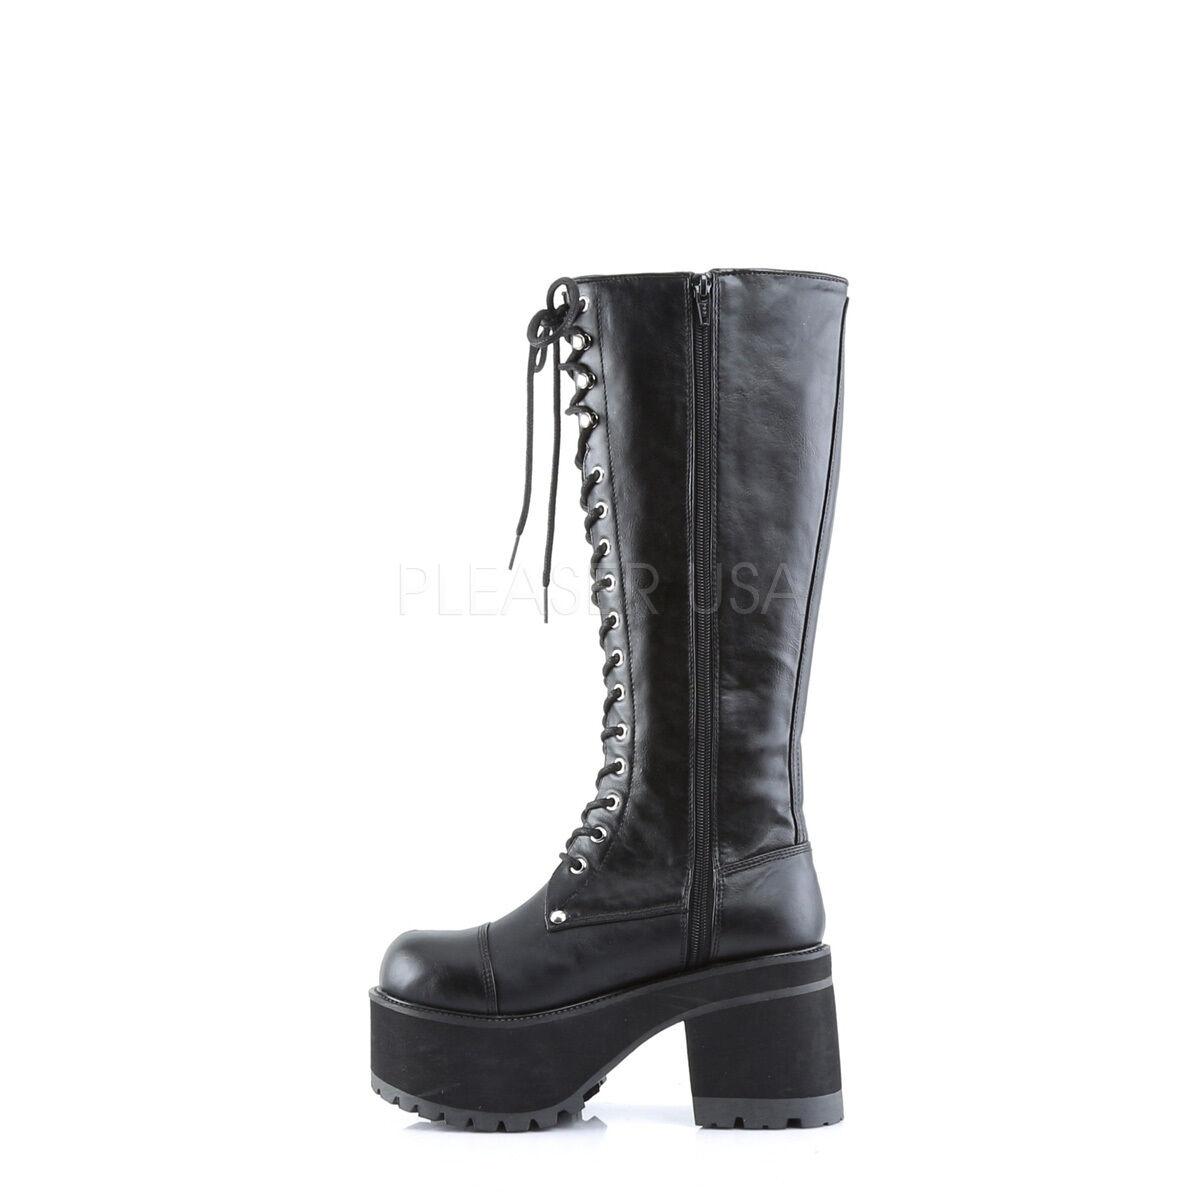 Demonia ran302 b b b pu Para Mujer Gothic Industrial Militar Plataforma Negro Rodilla botas 8b21f6